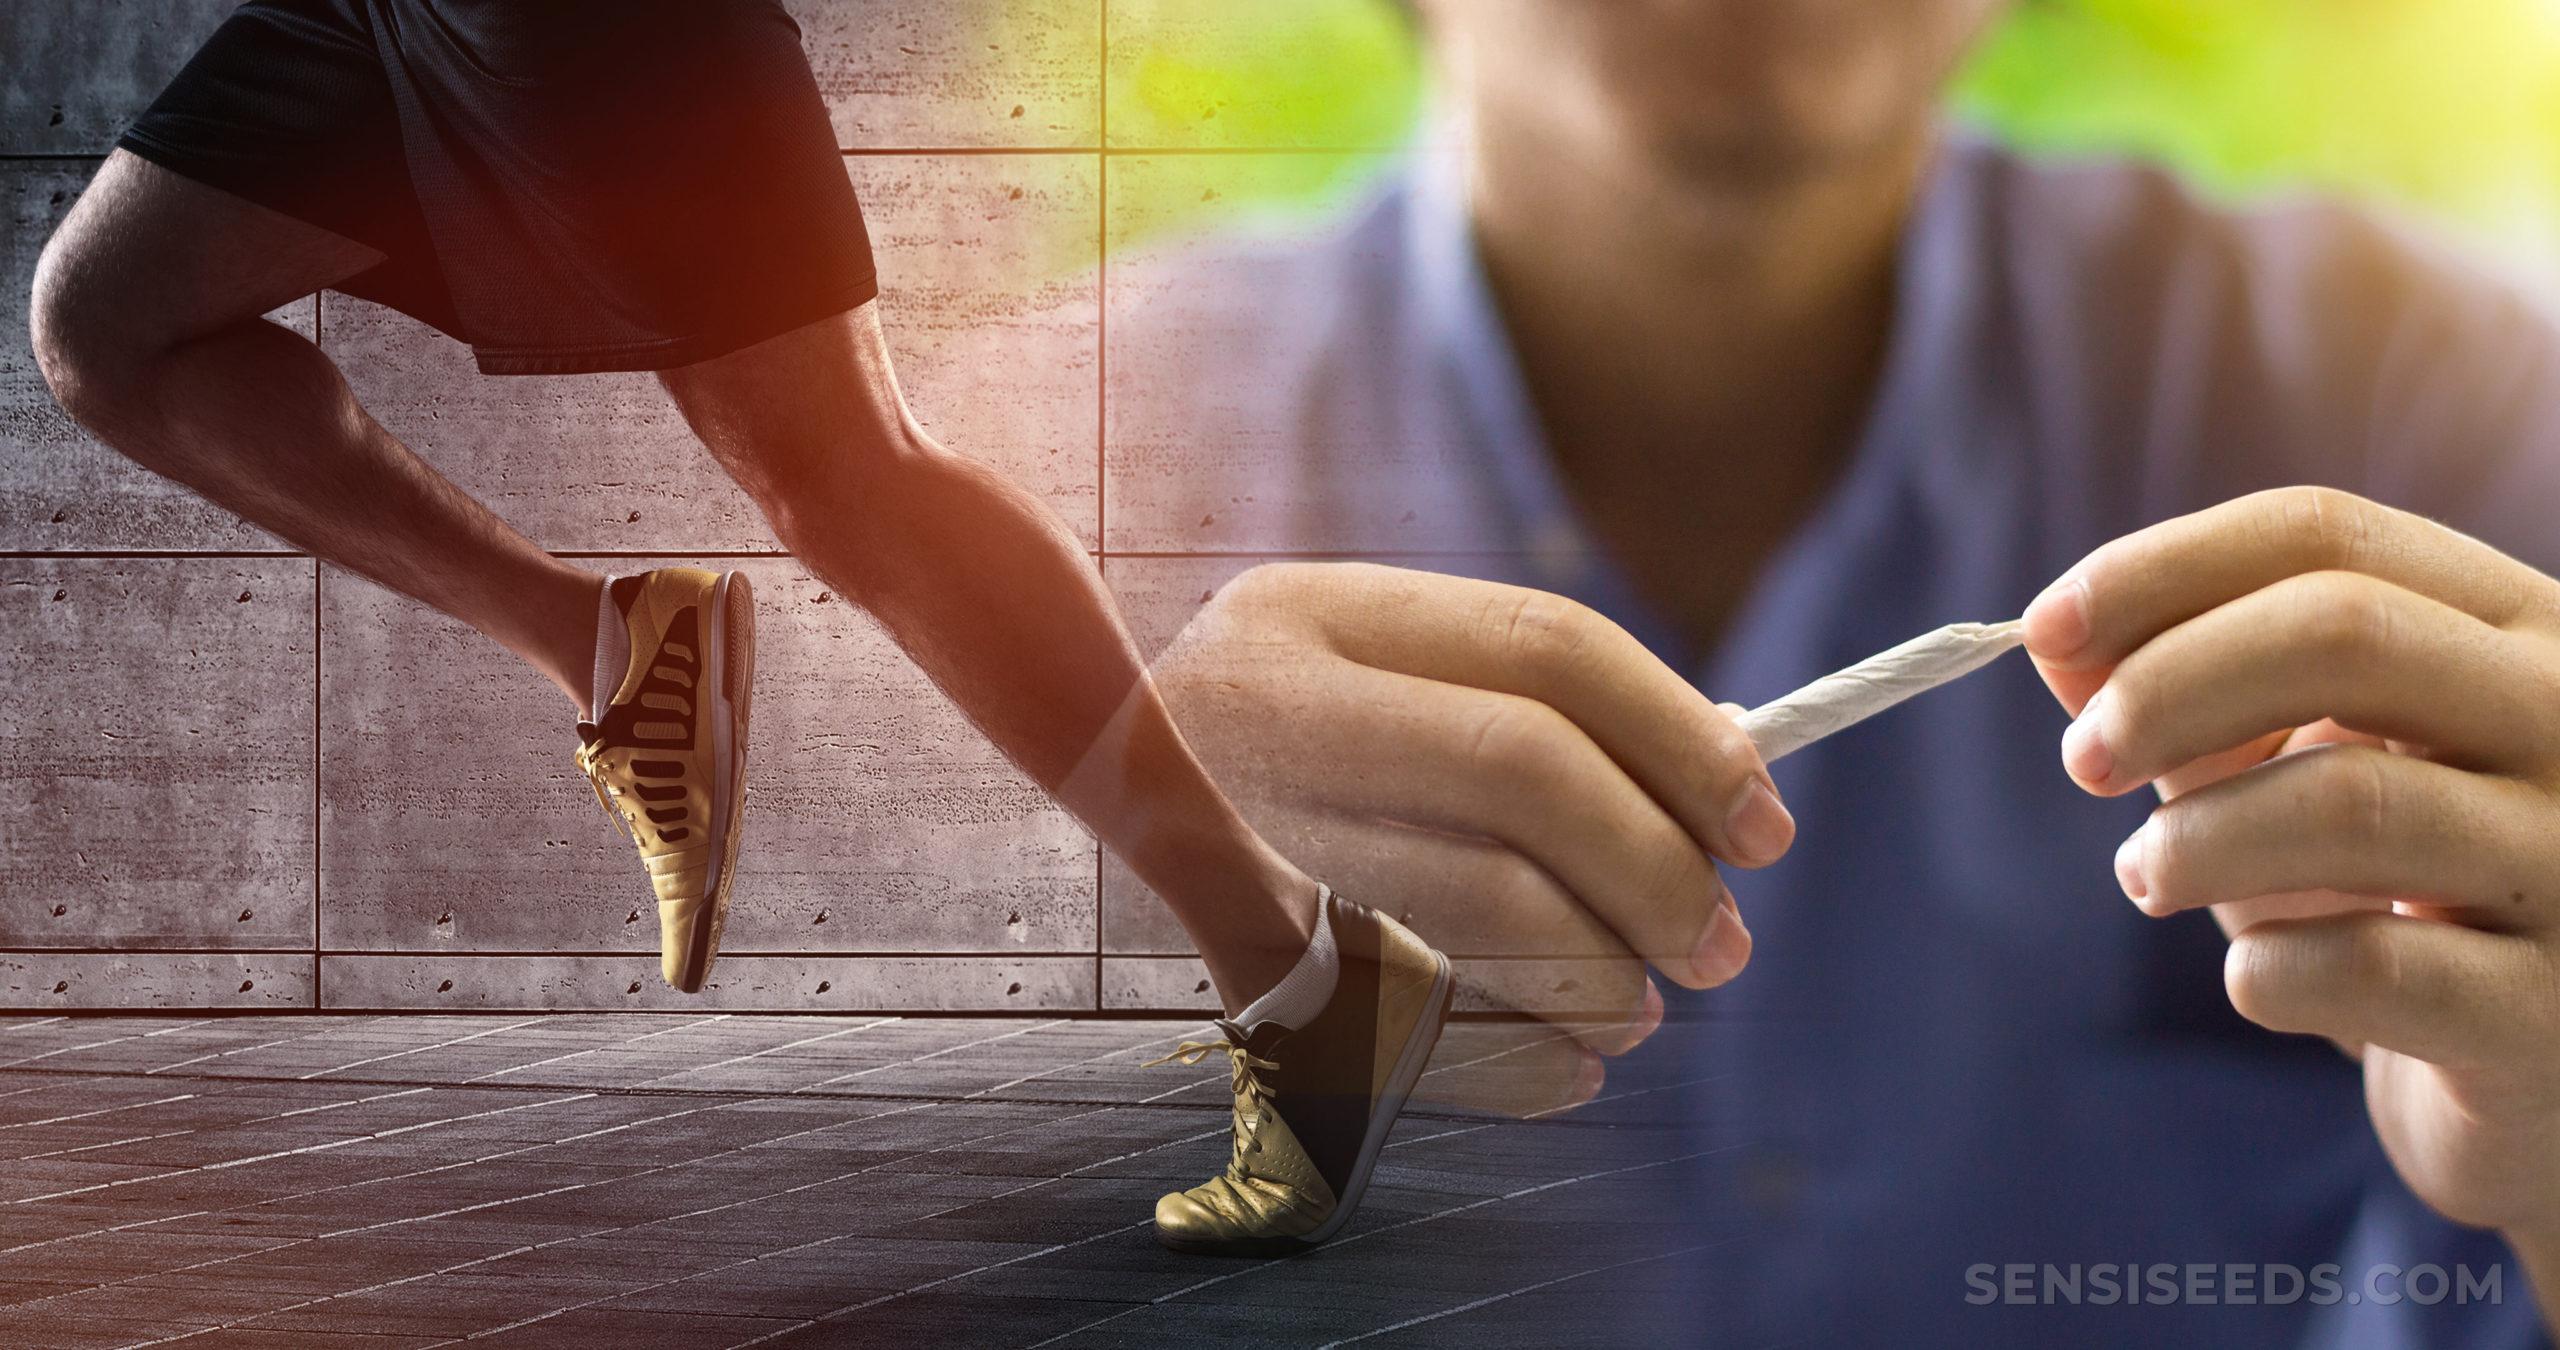 Cannabis y Deporte: ¿Dopaje o No? - Sensi Seeds